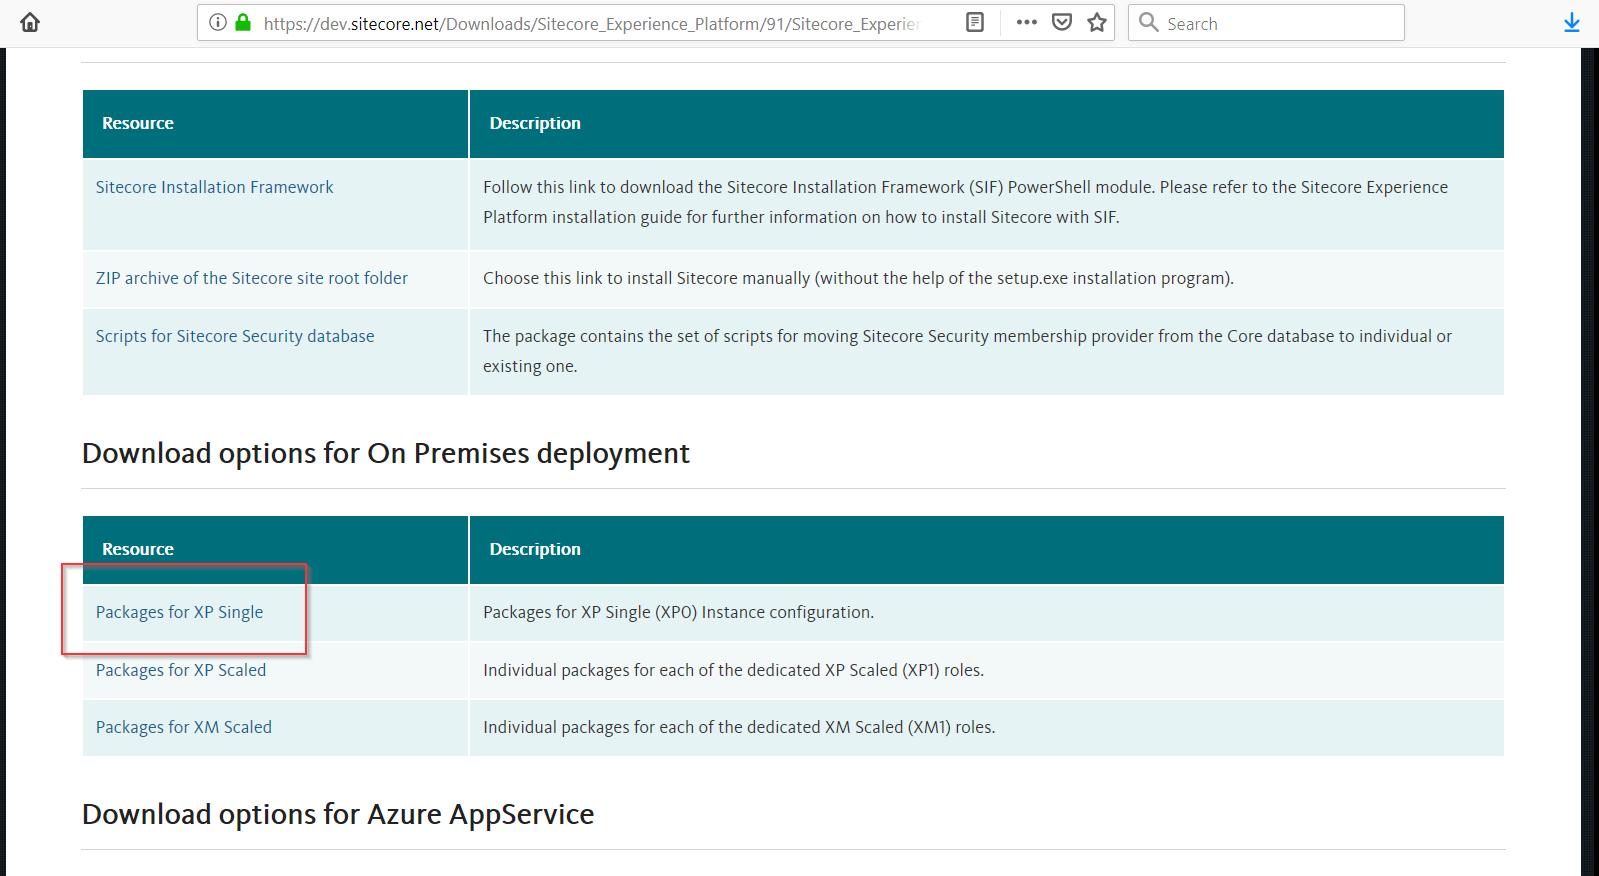 Sitecore 9 1 Initial Release Installation Guide for Development